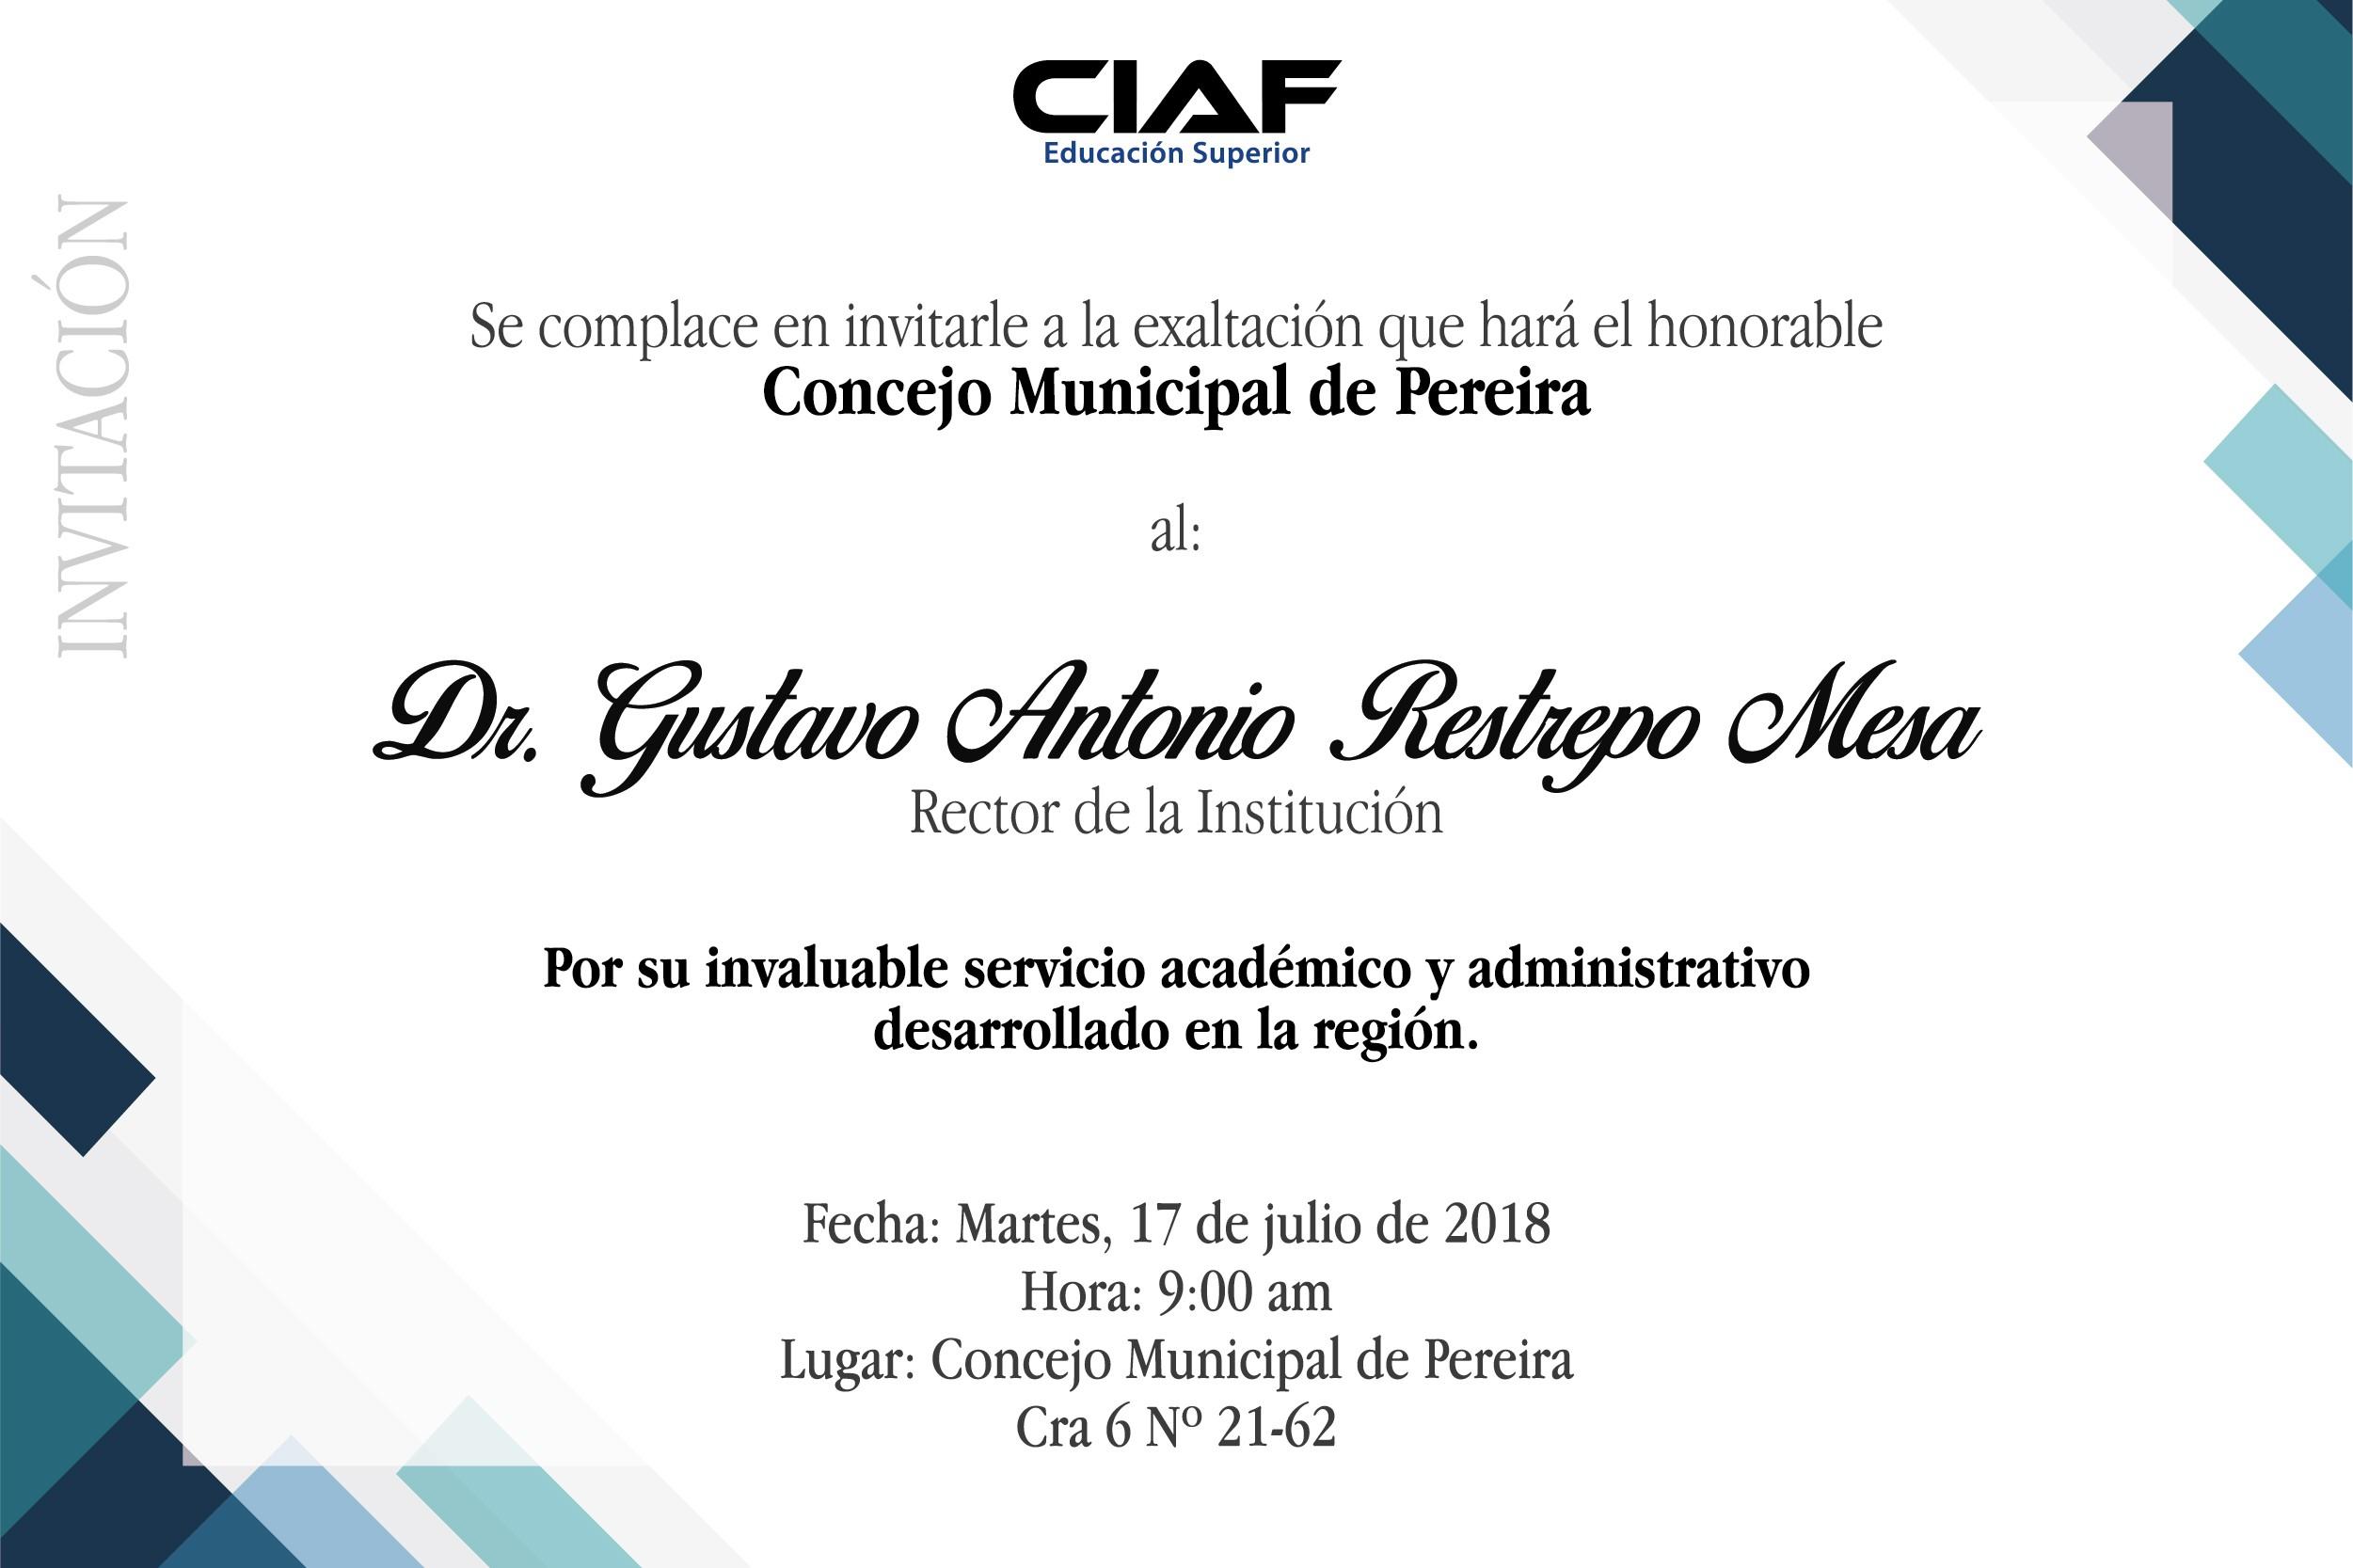 Concejo de Pereira exalta la labor del rector Gustavo A Restrepo Mesa